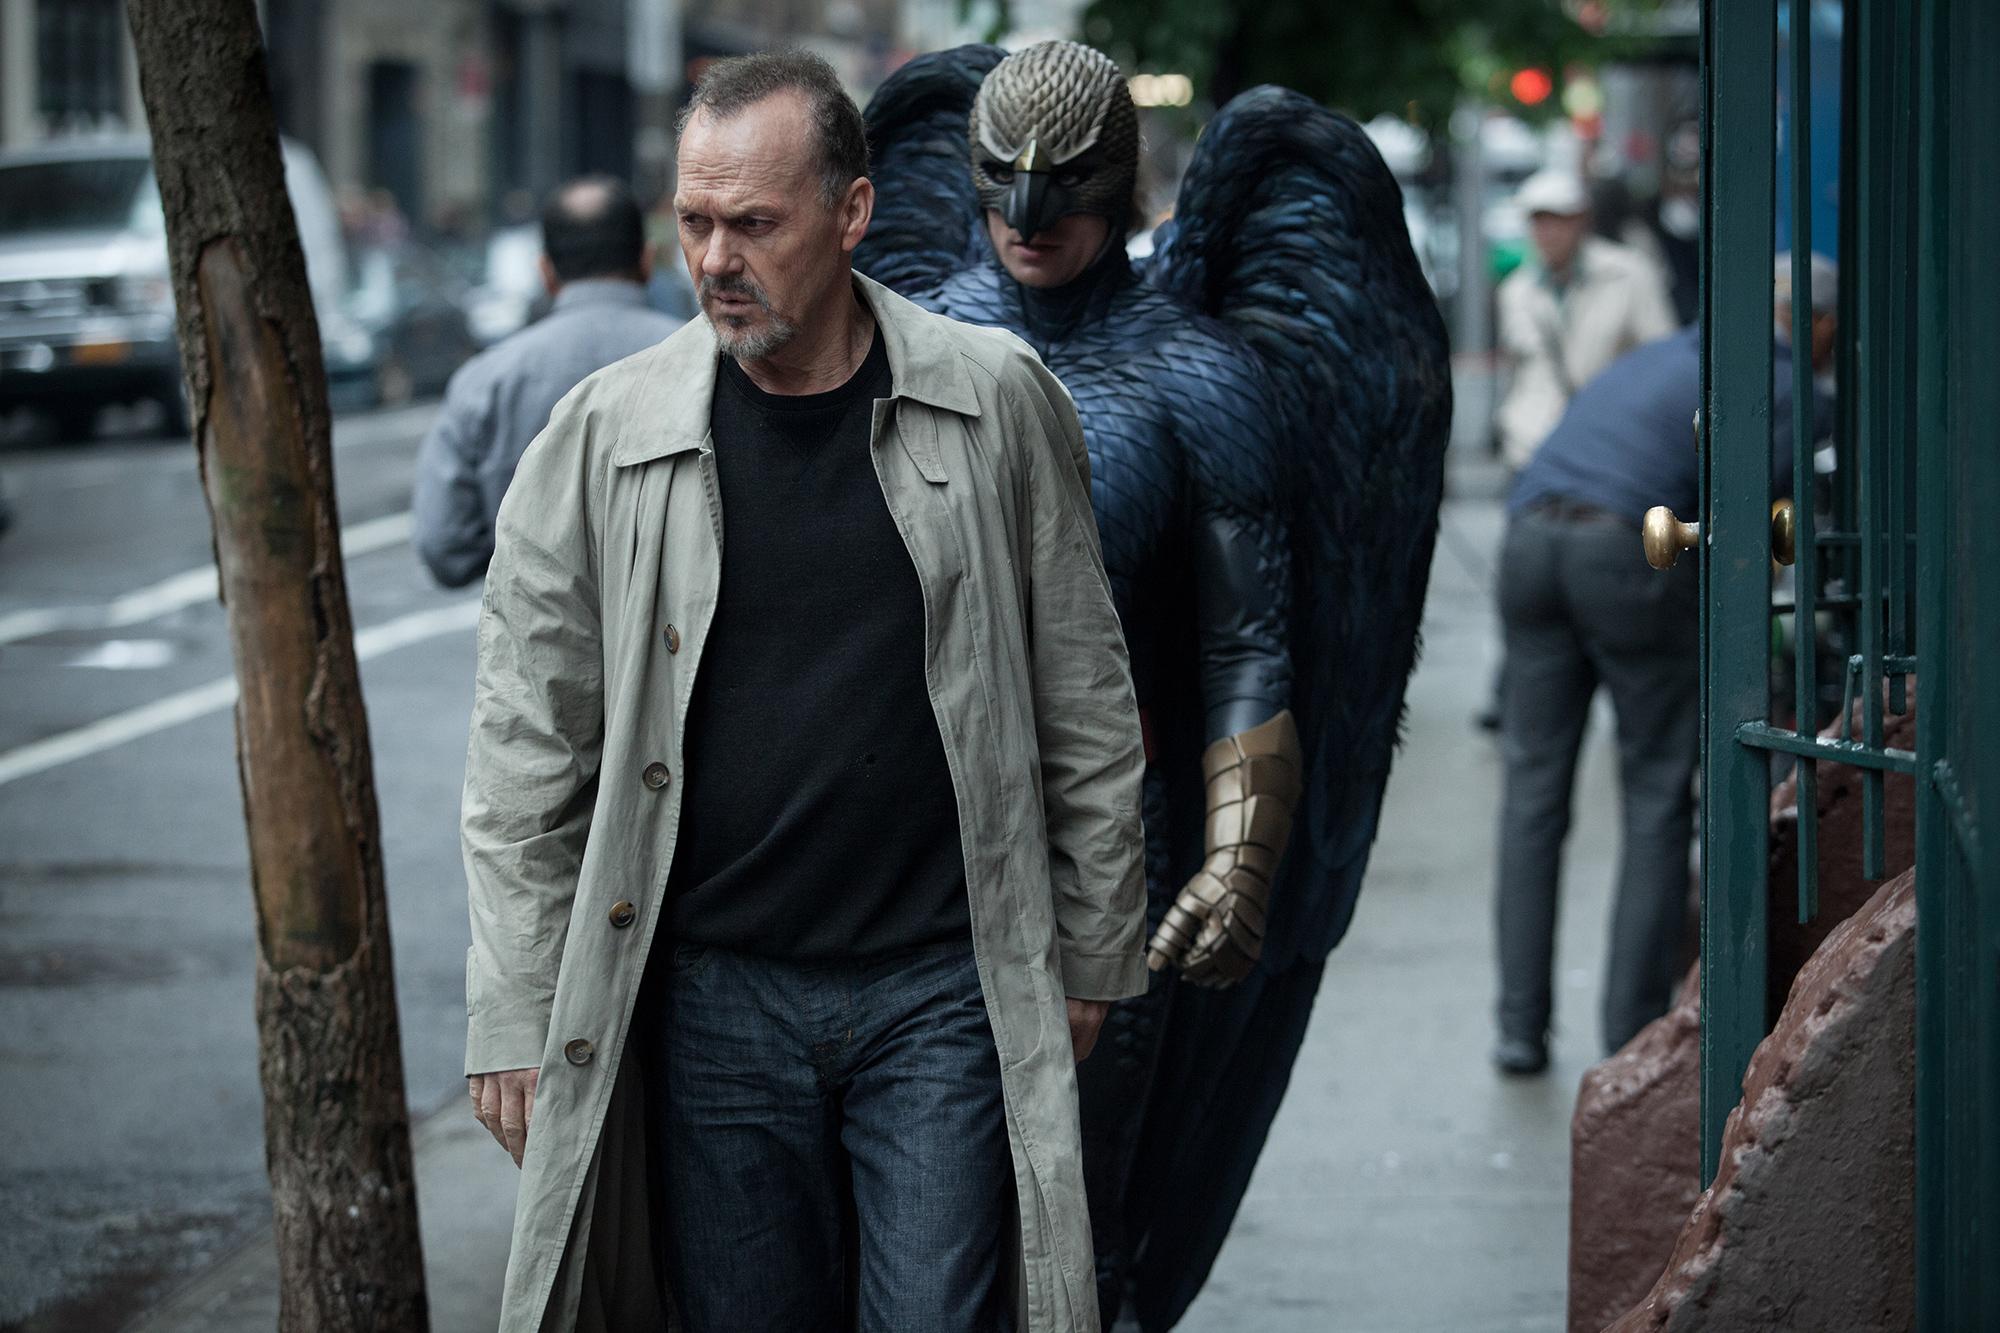 Oscars 2015: 'Birdman,' 'Grand Budapest Hotel' Win Big